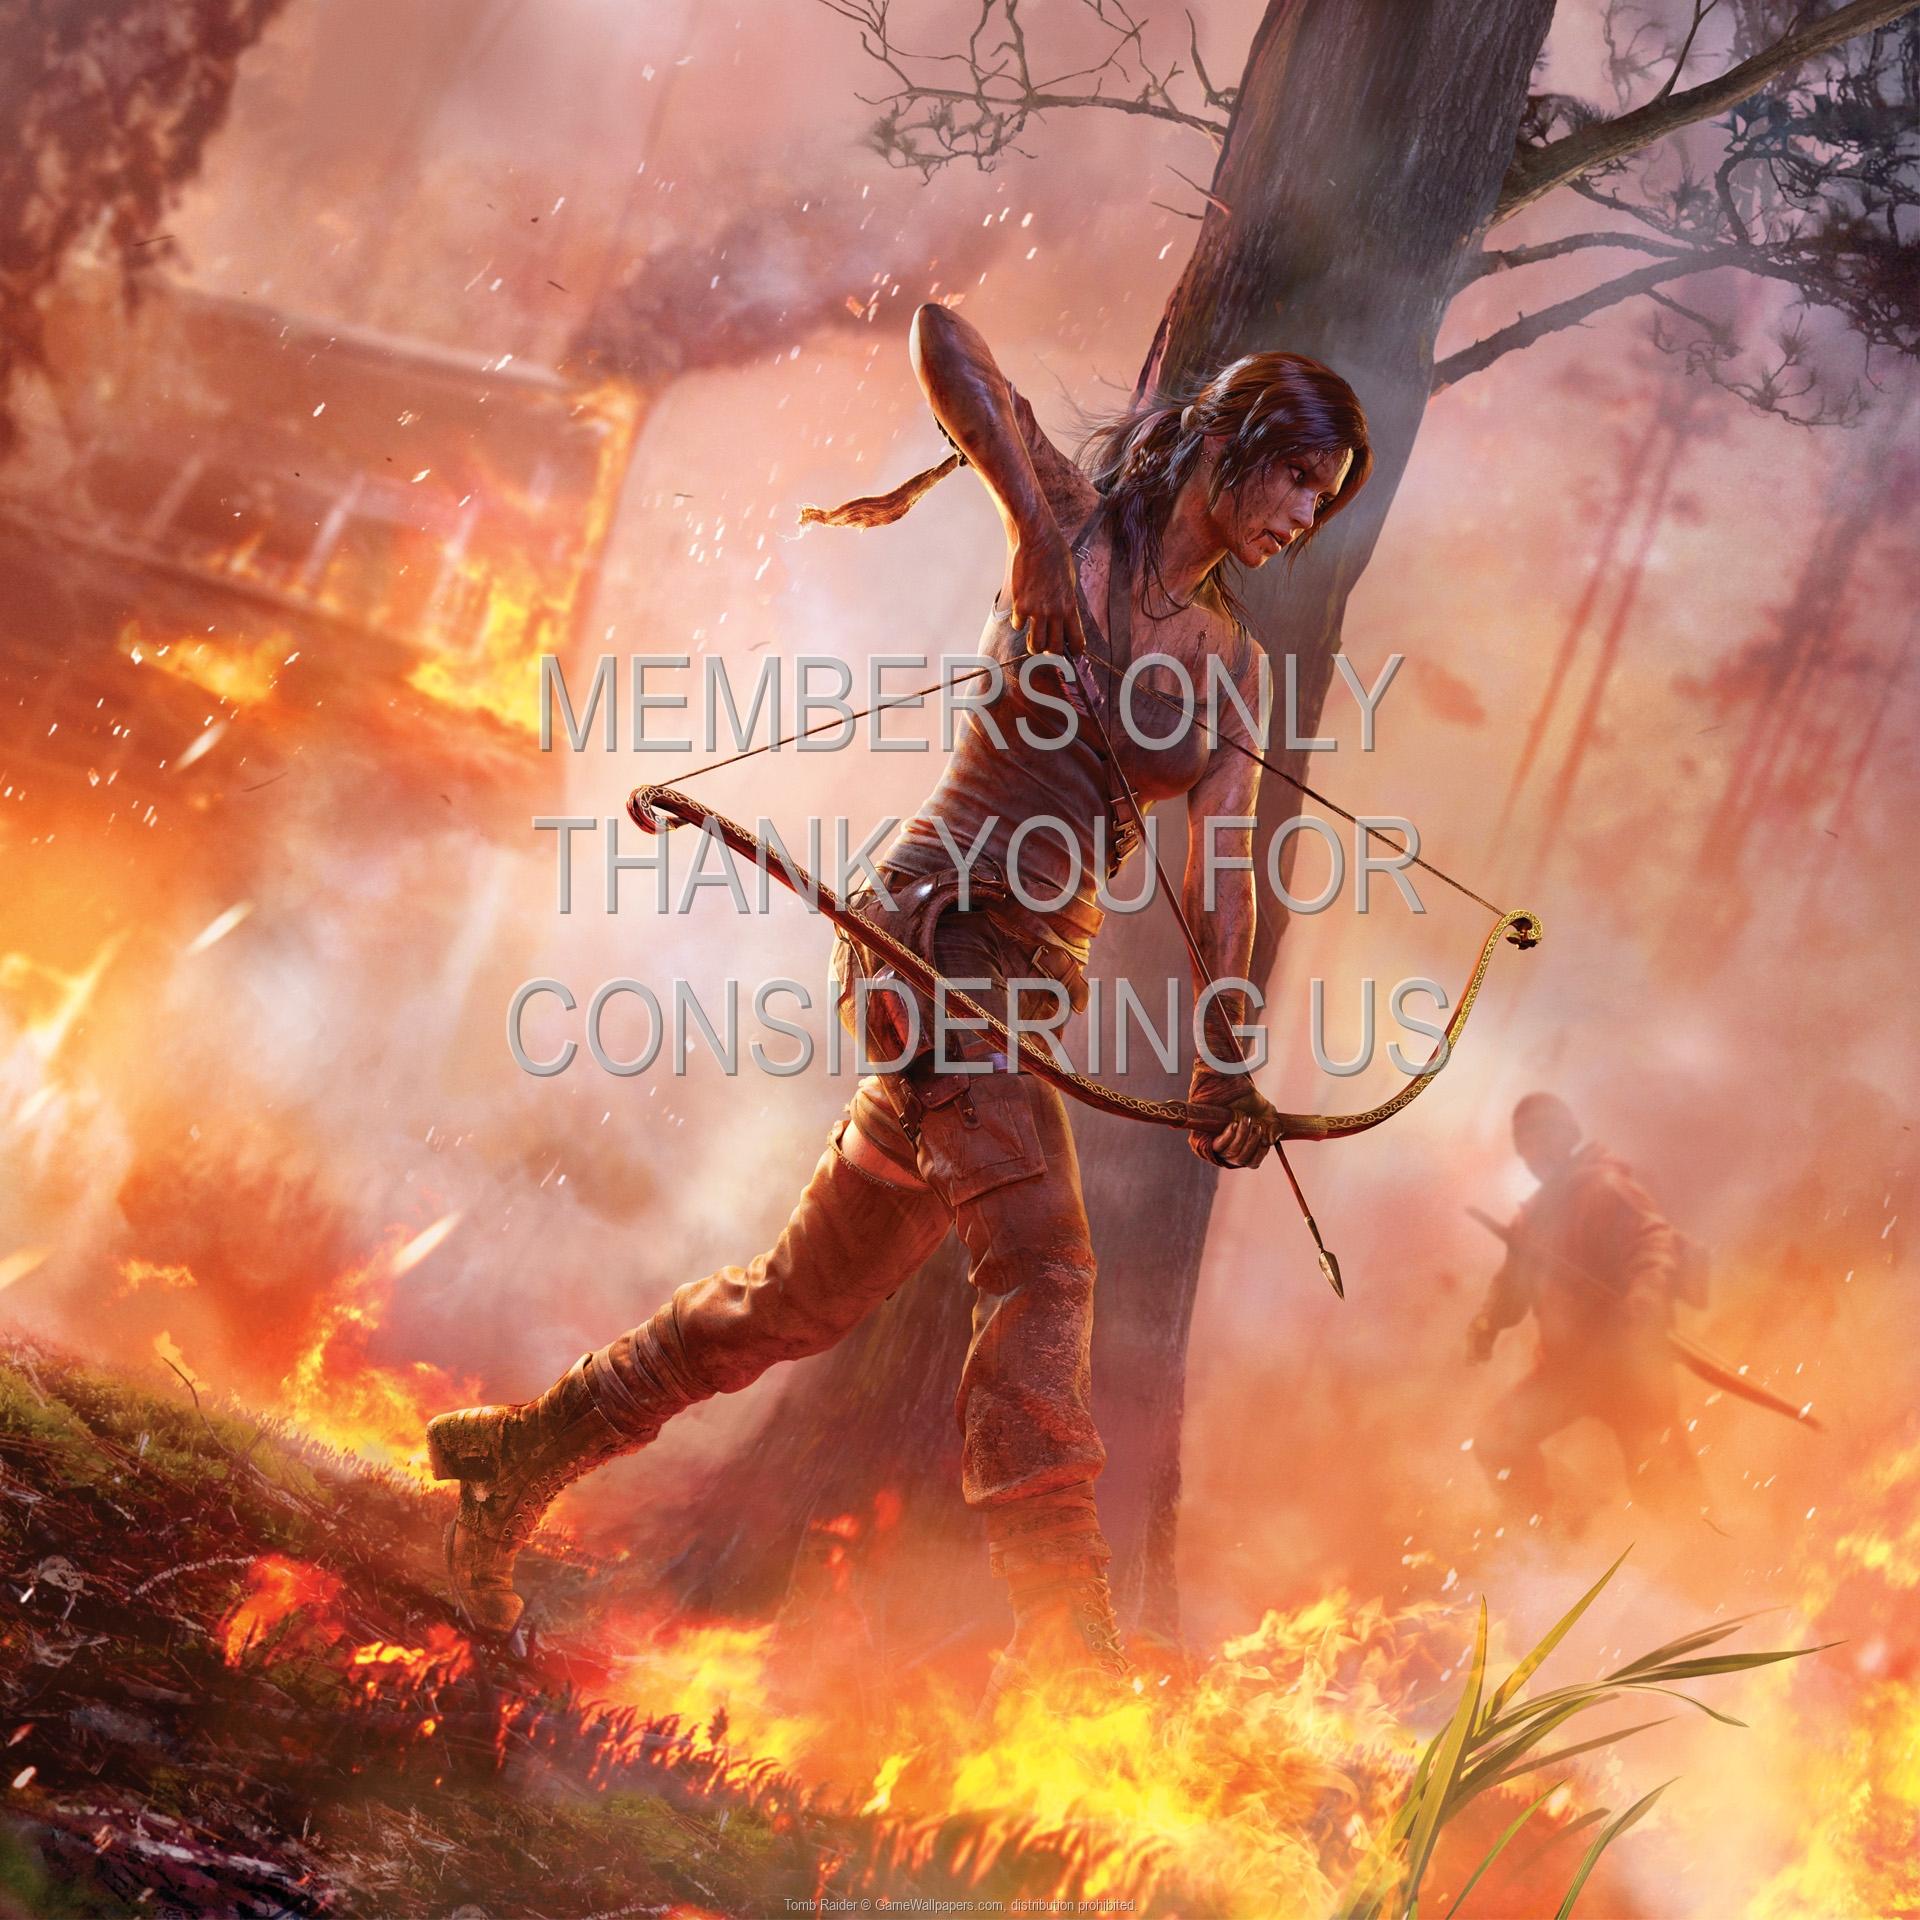 Tomb Raider 1920x1080 Handy Hintergrundbild 04